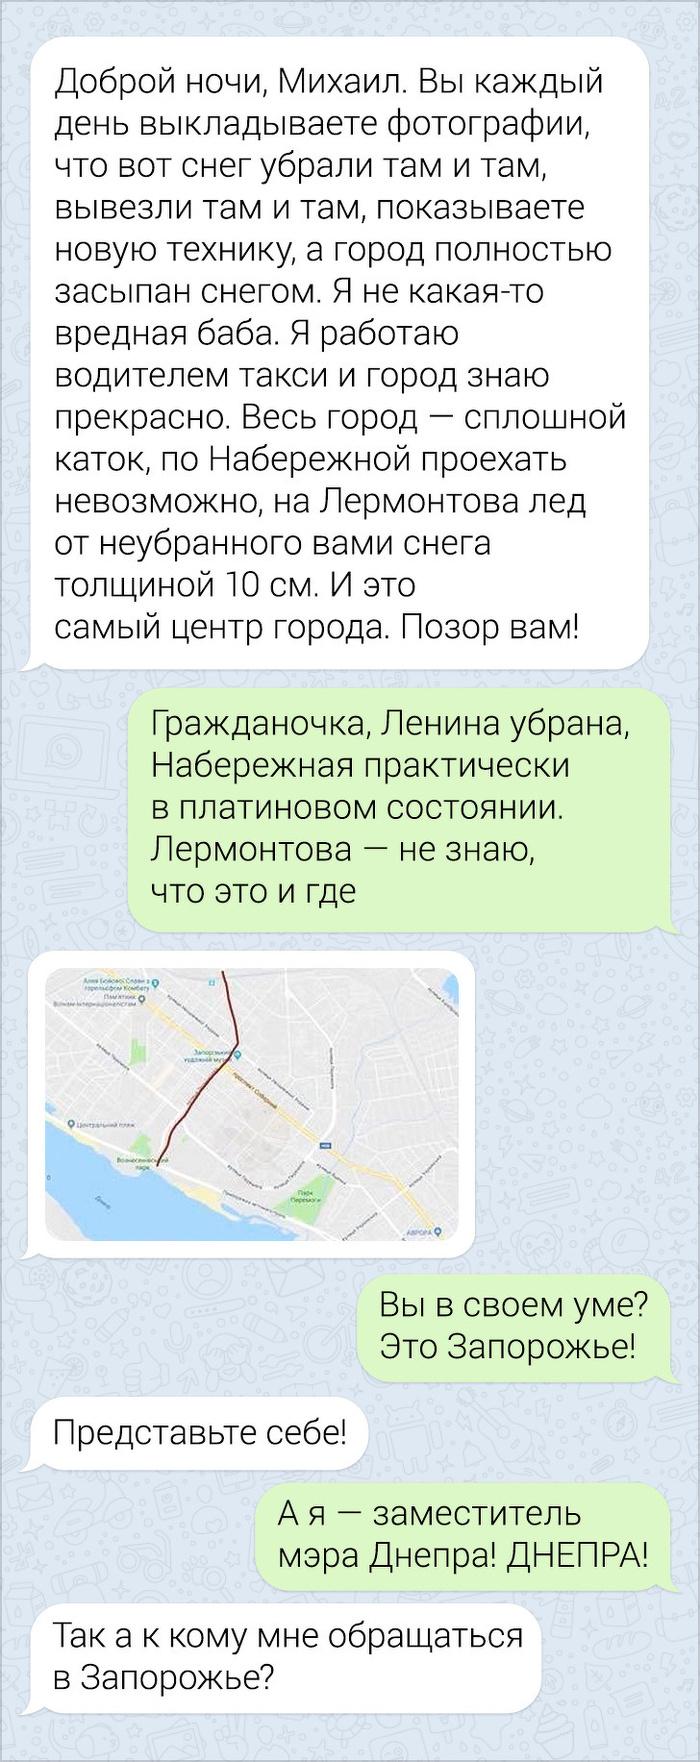 Мэр Мэр, Город, Переписка, Длиннопост